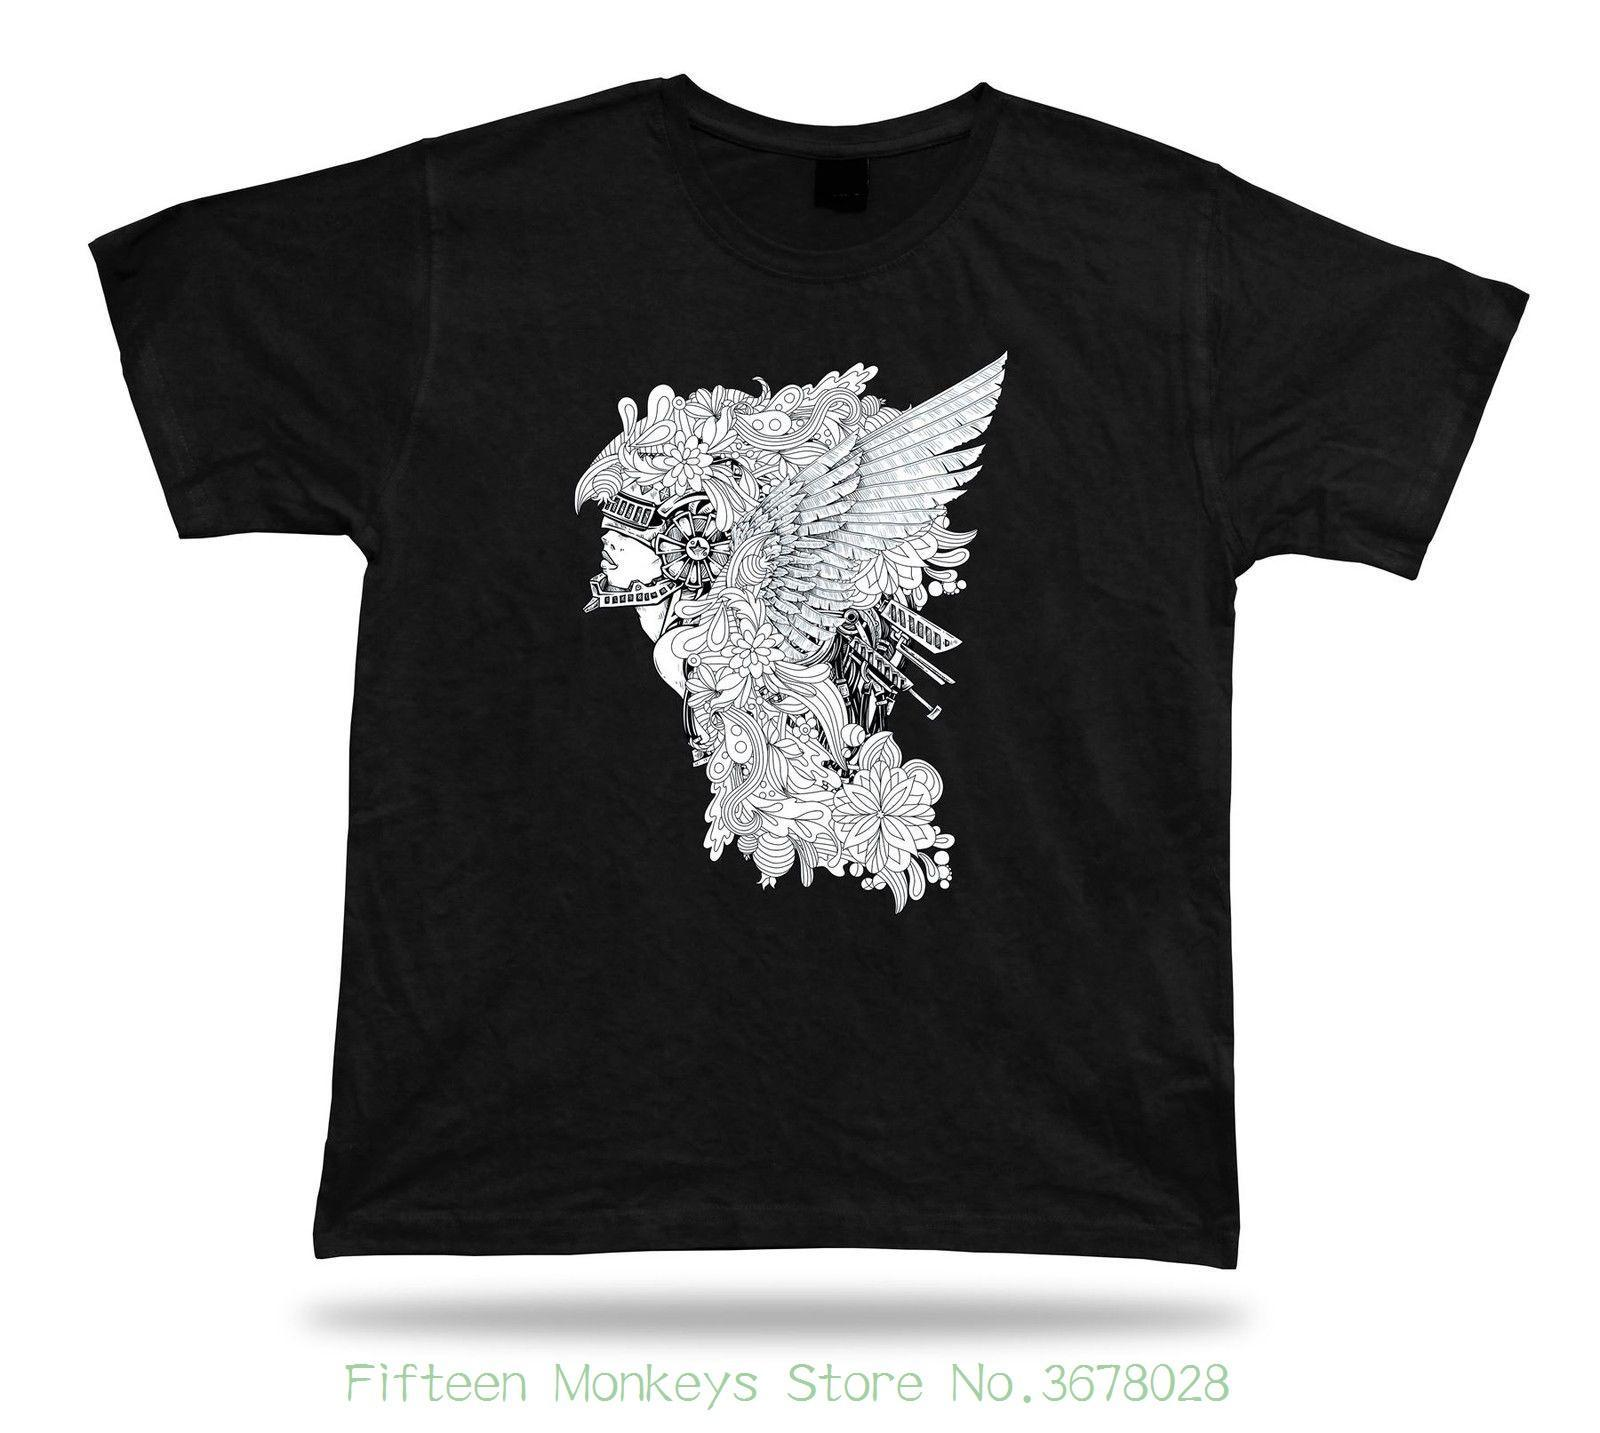 50 Blank Gildan Heavy Cotton T-Shirt Wholesale Bulk Lot ok to mix S-XL /& Colors